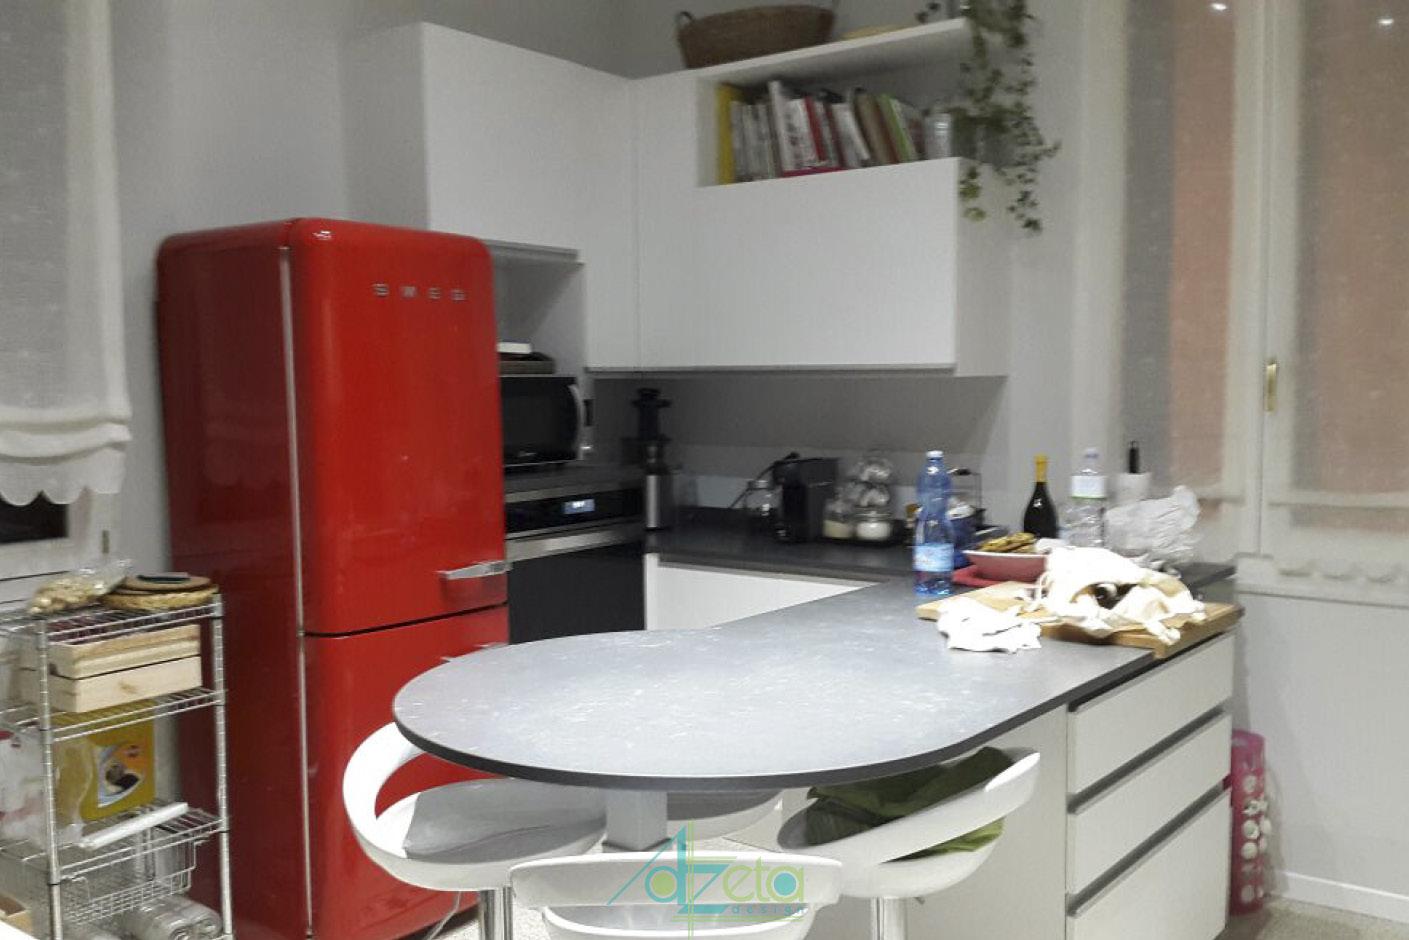 Cucina con penisola azetadesign - Cucina rustica con penisola ...